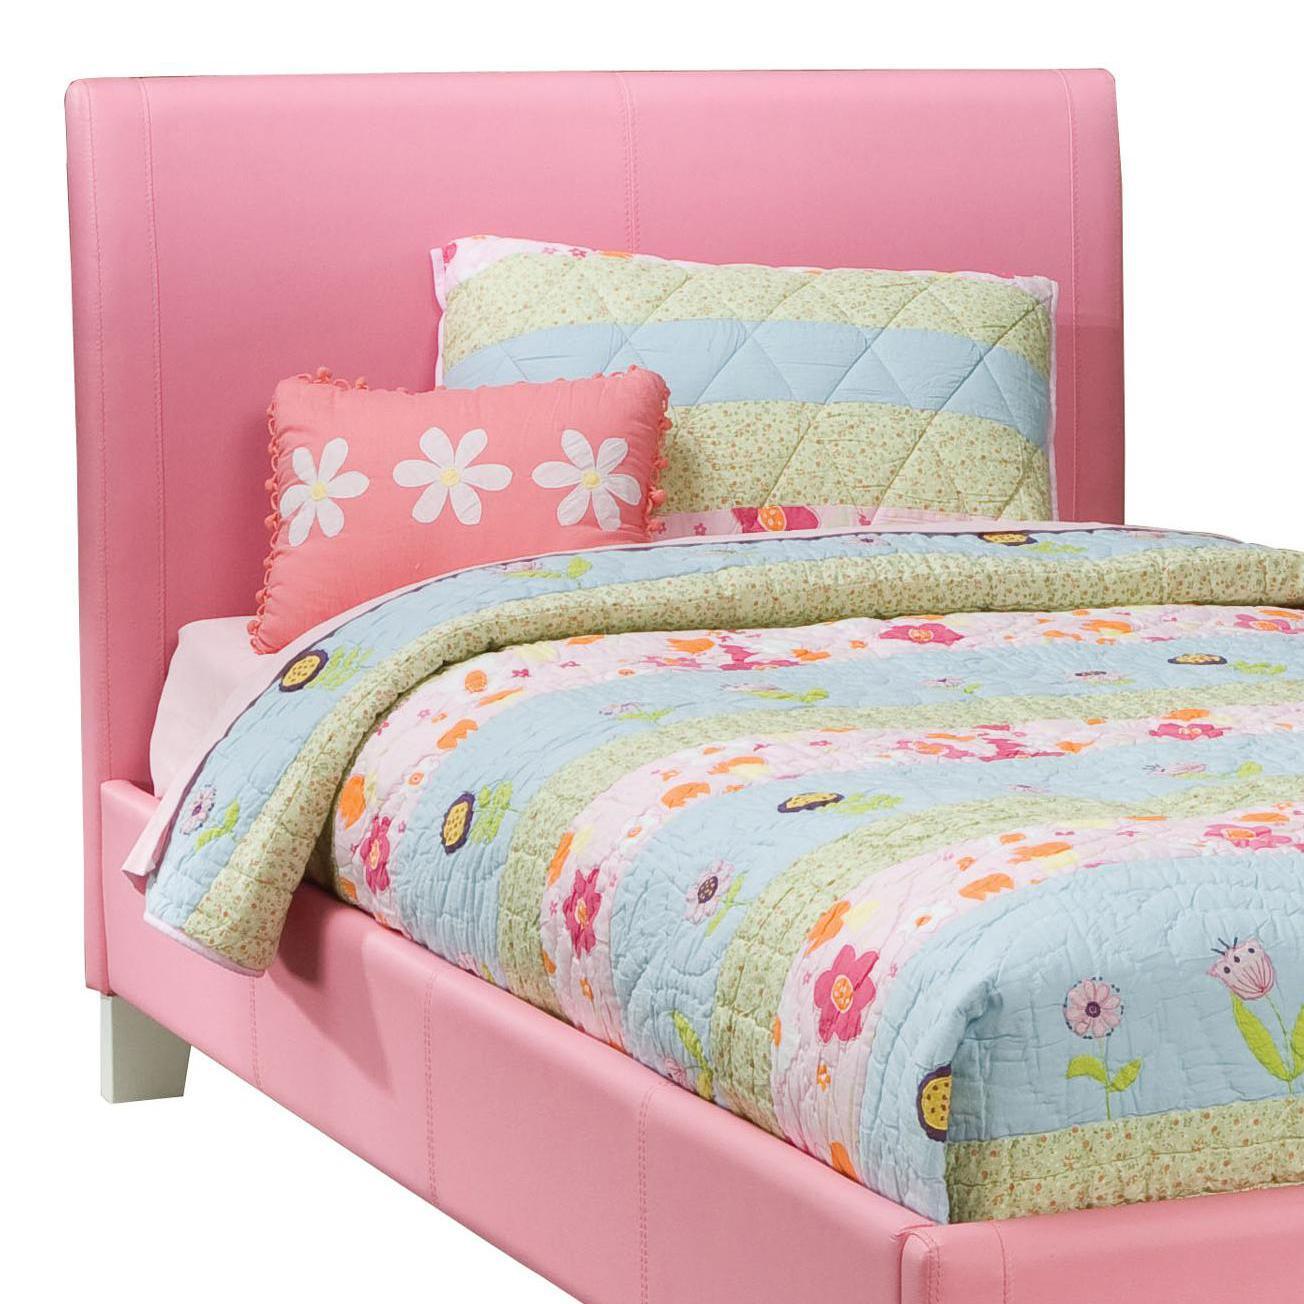 Standard Furniture Fantasia Twin Upholstered Headboard - Item Number: 60773